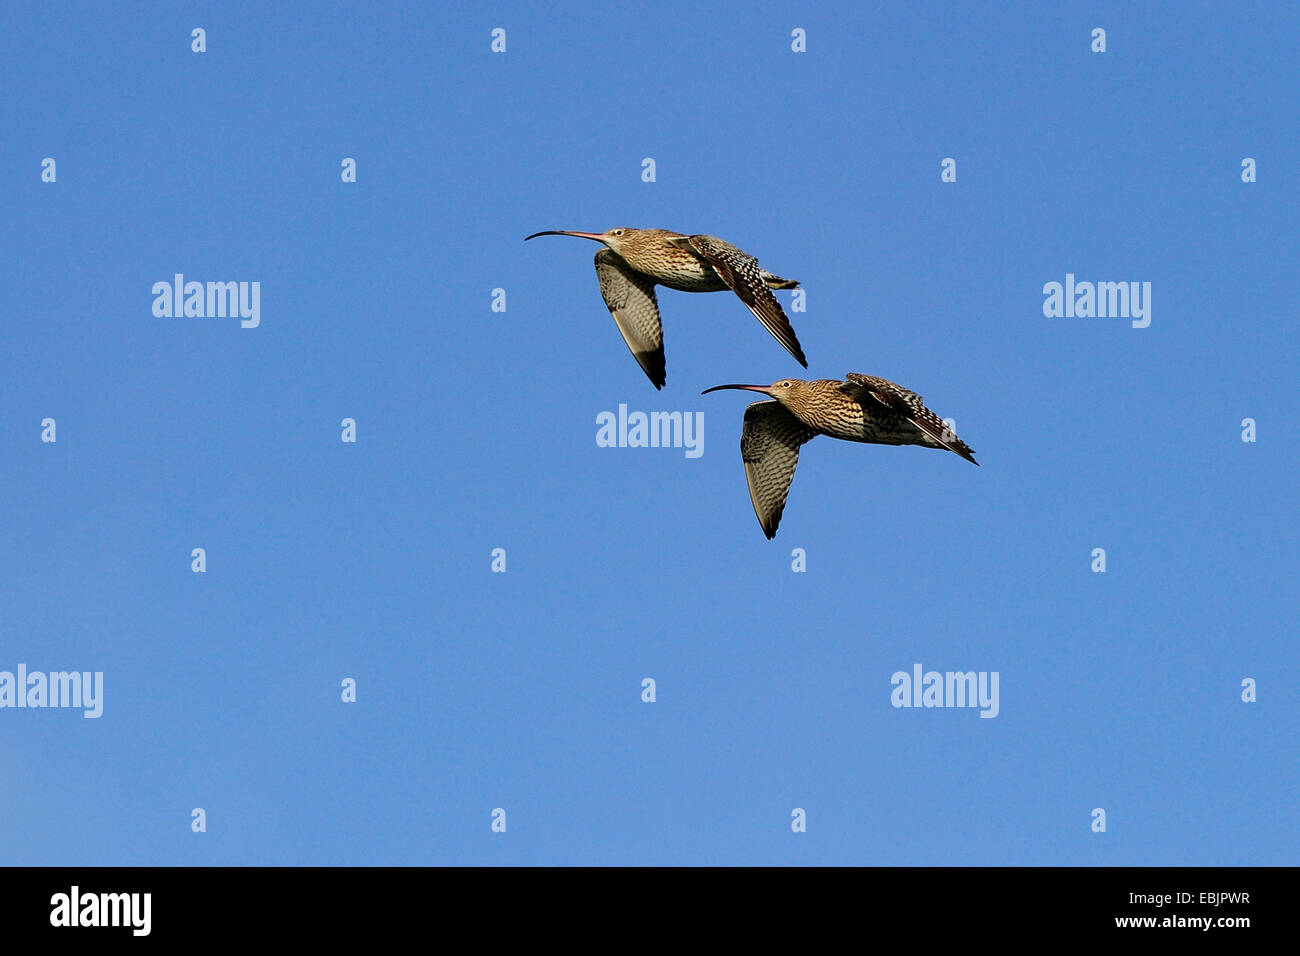 western curlew (Numenius arquata), two birds flying, Germany, North Rhine-Westphalia - Stock Image